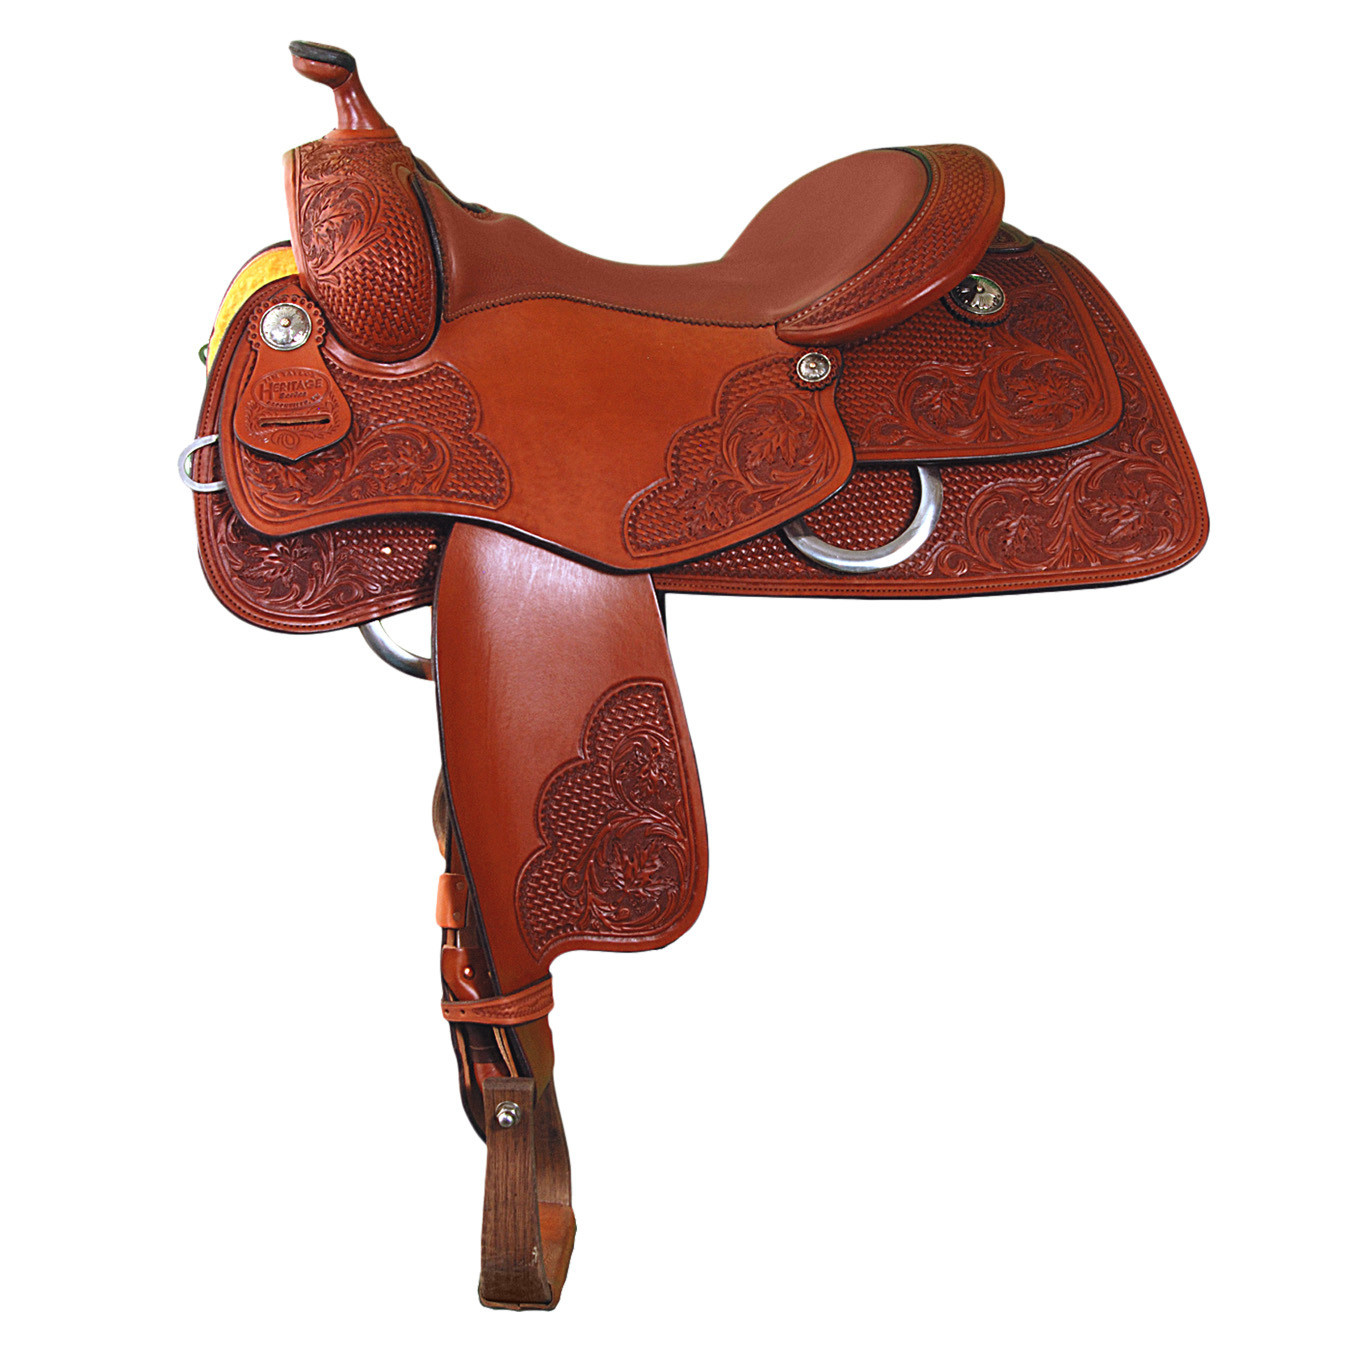 Jim Taylor Custom saddle Jim Taylor example saddle 4